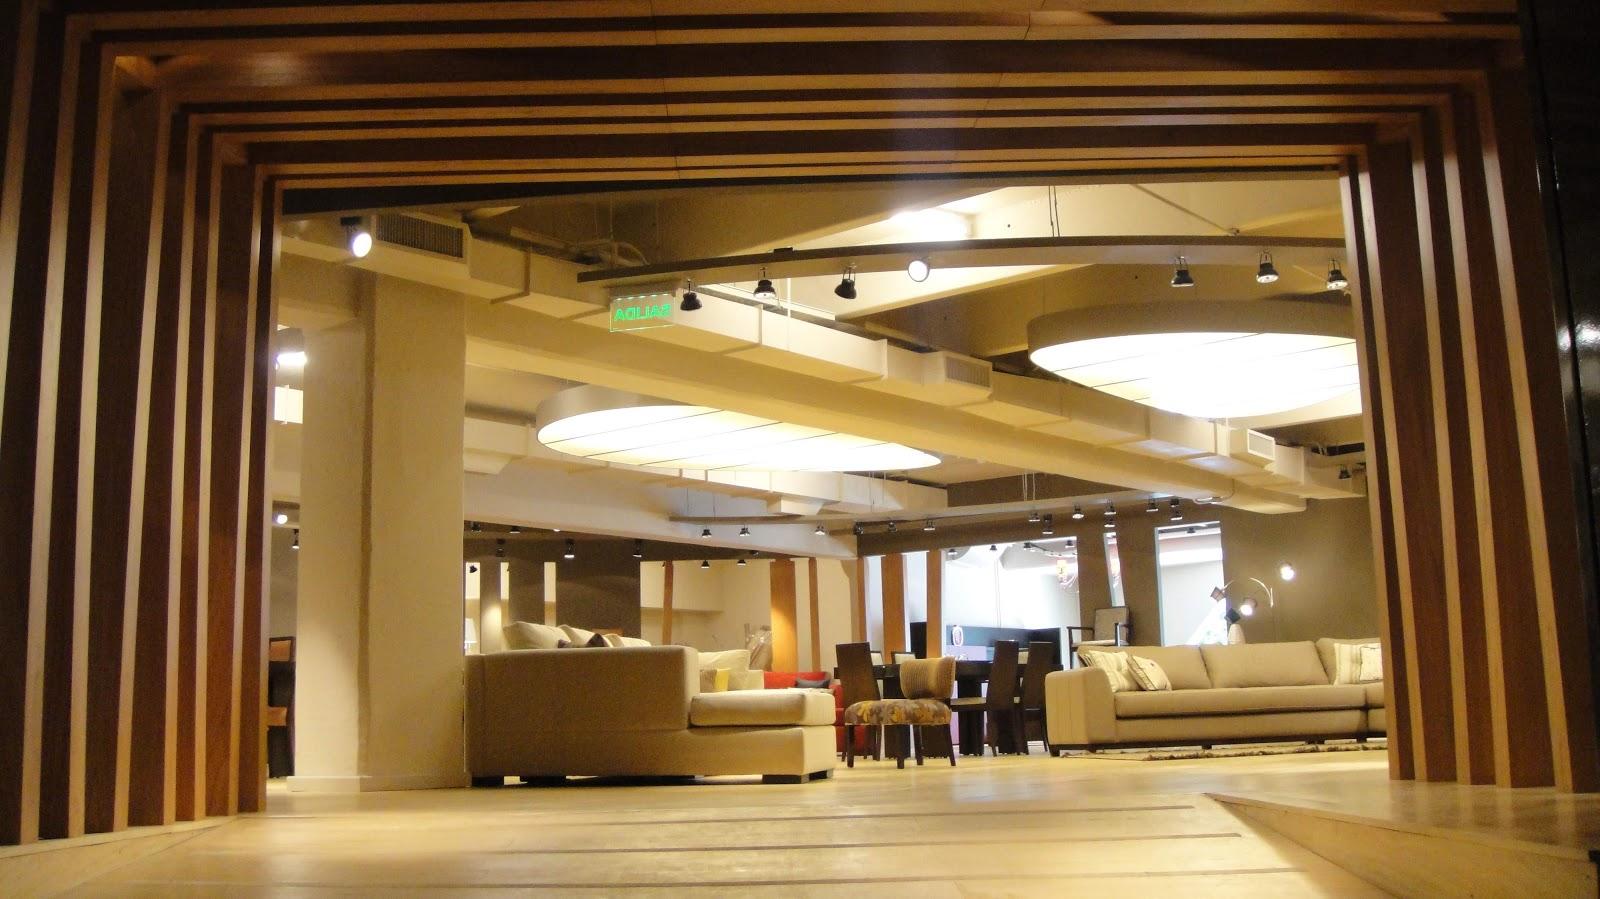 Muebles de cocina buenos aires design ideas for Muebles de oficina modernos buenos aires